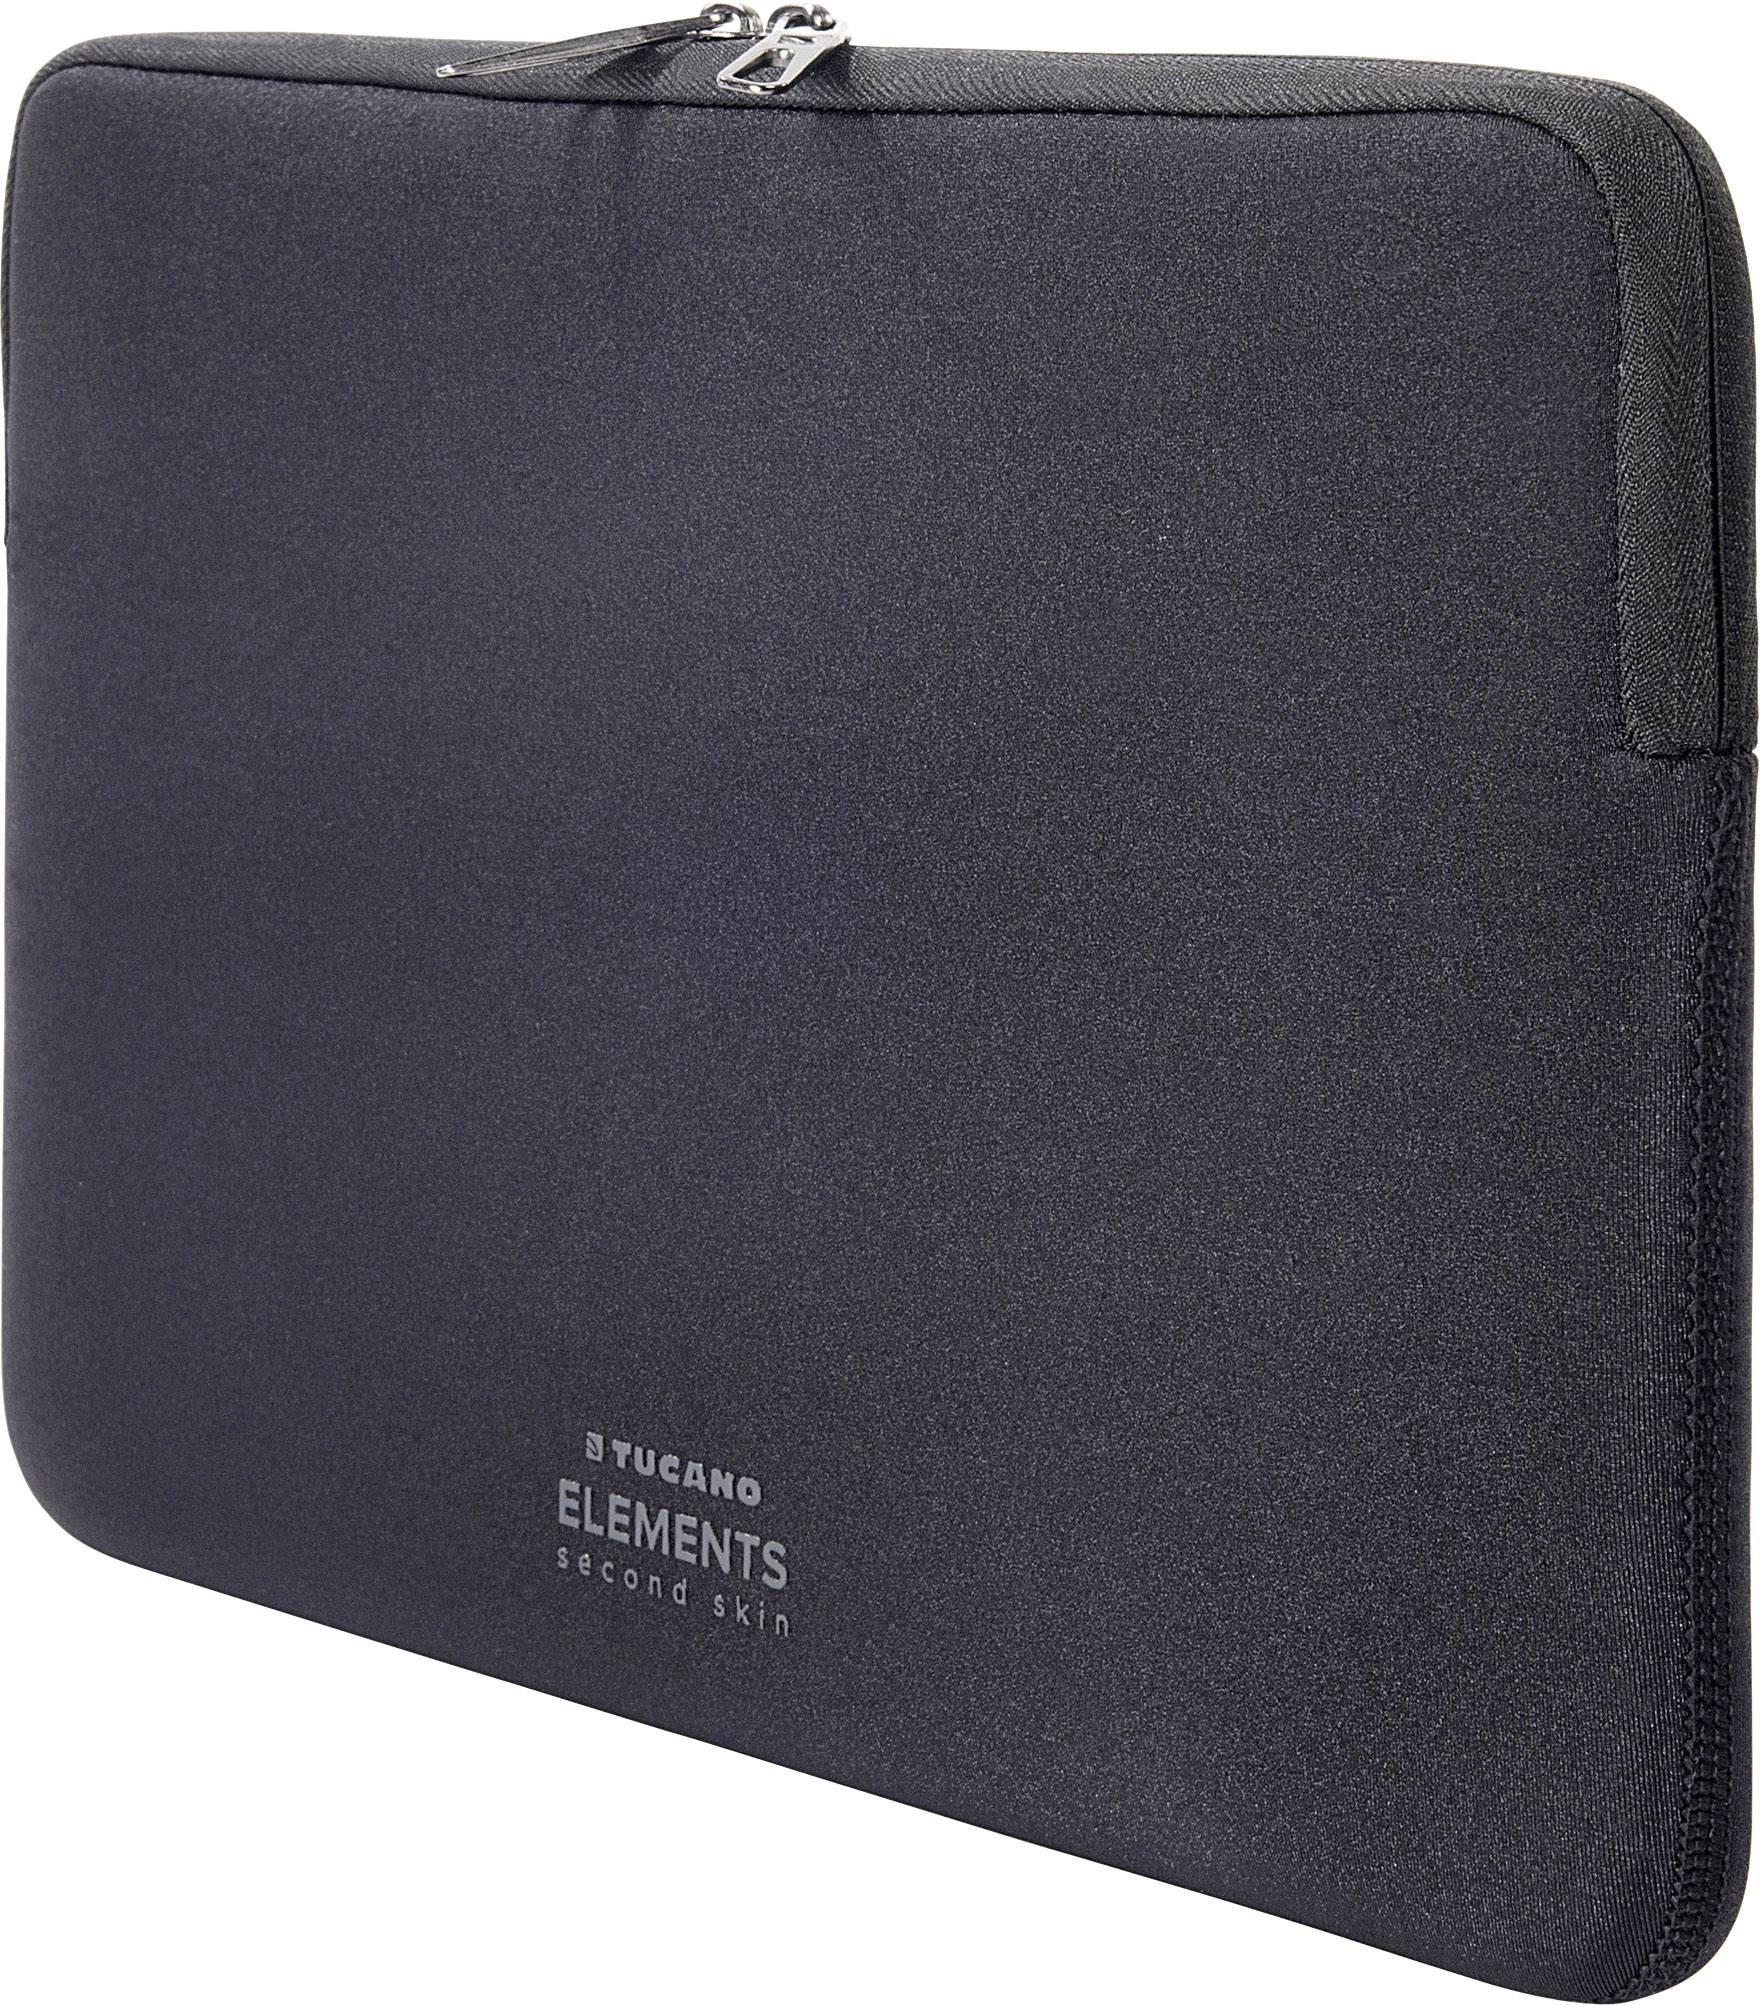 Tucano Laptop sleeve ELEMENTS Sleeve Black